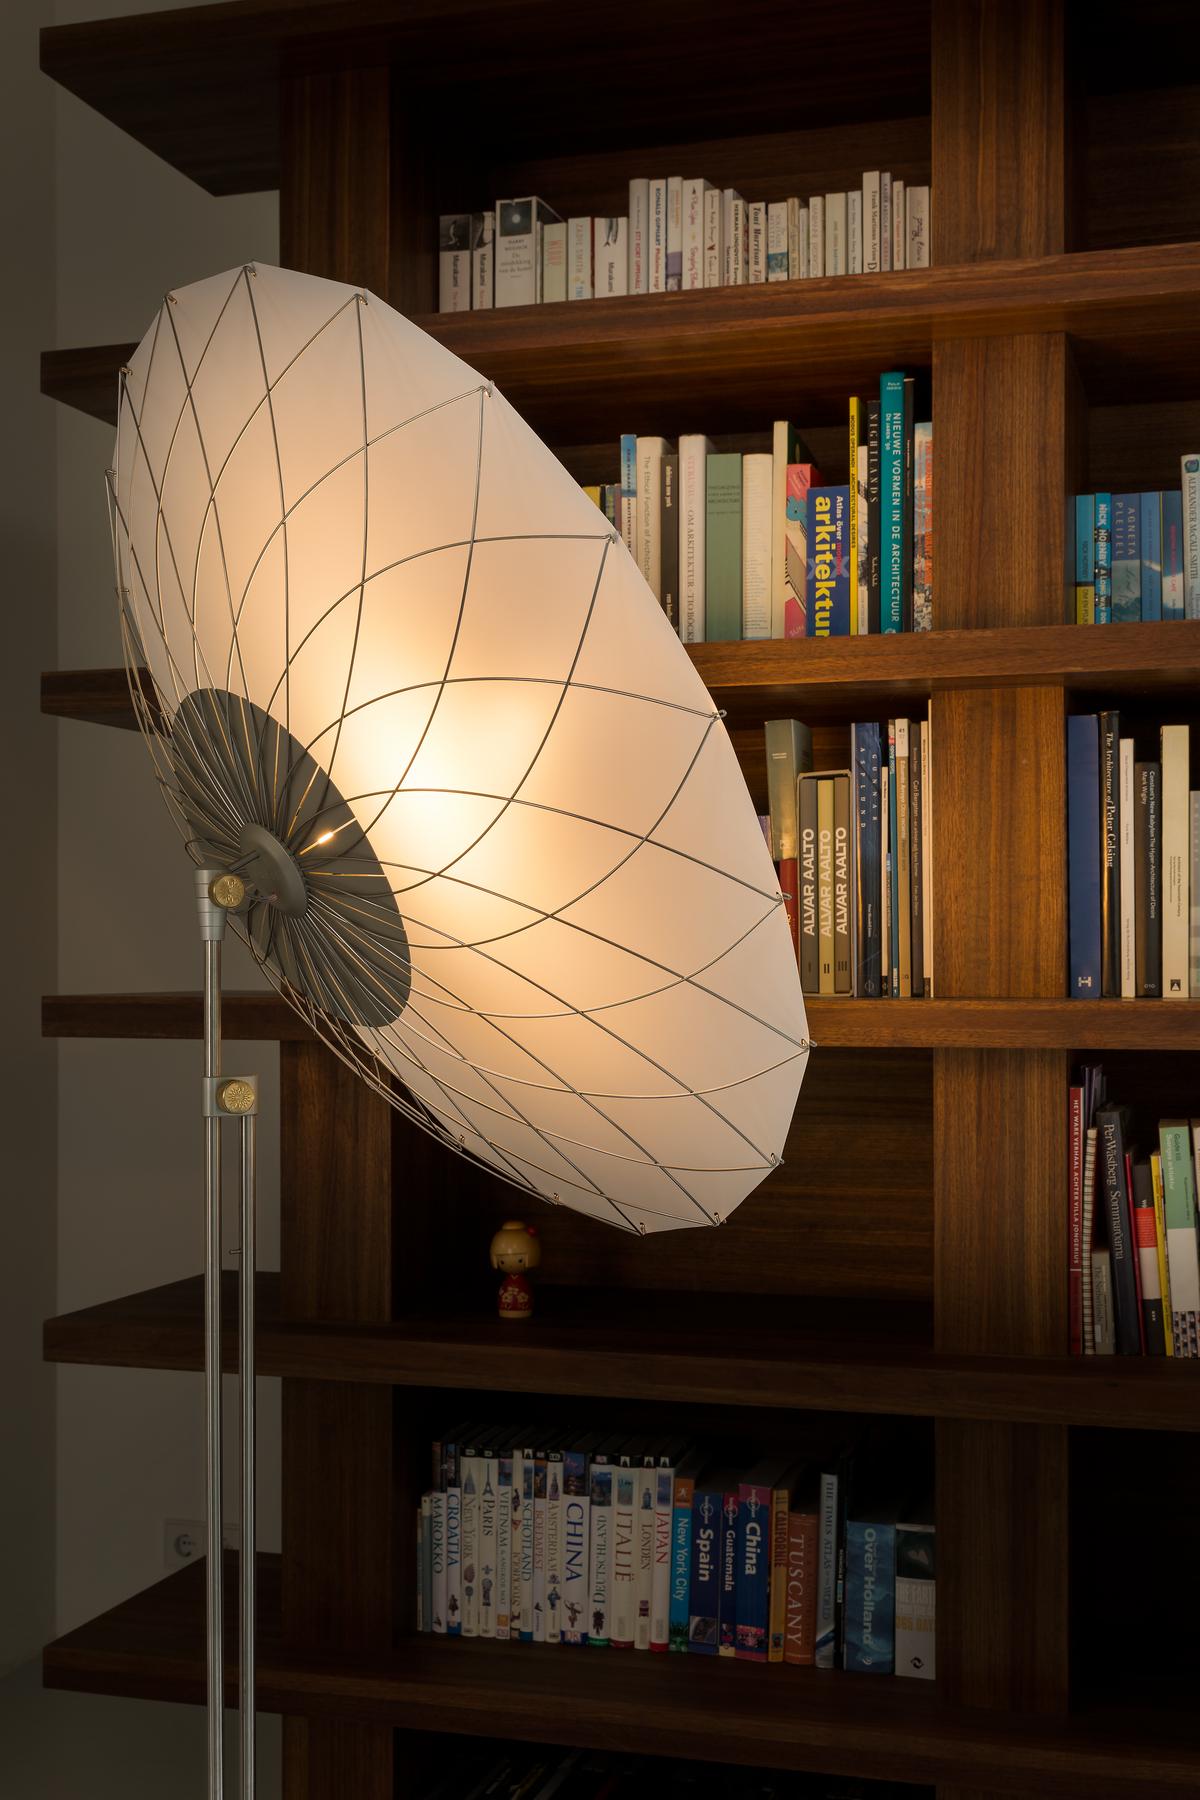 Filigree Floor Lamp in home interior